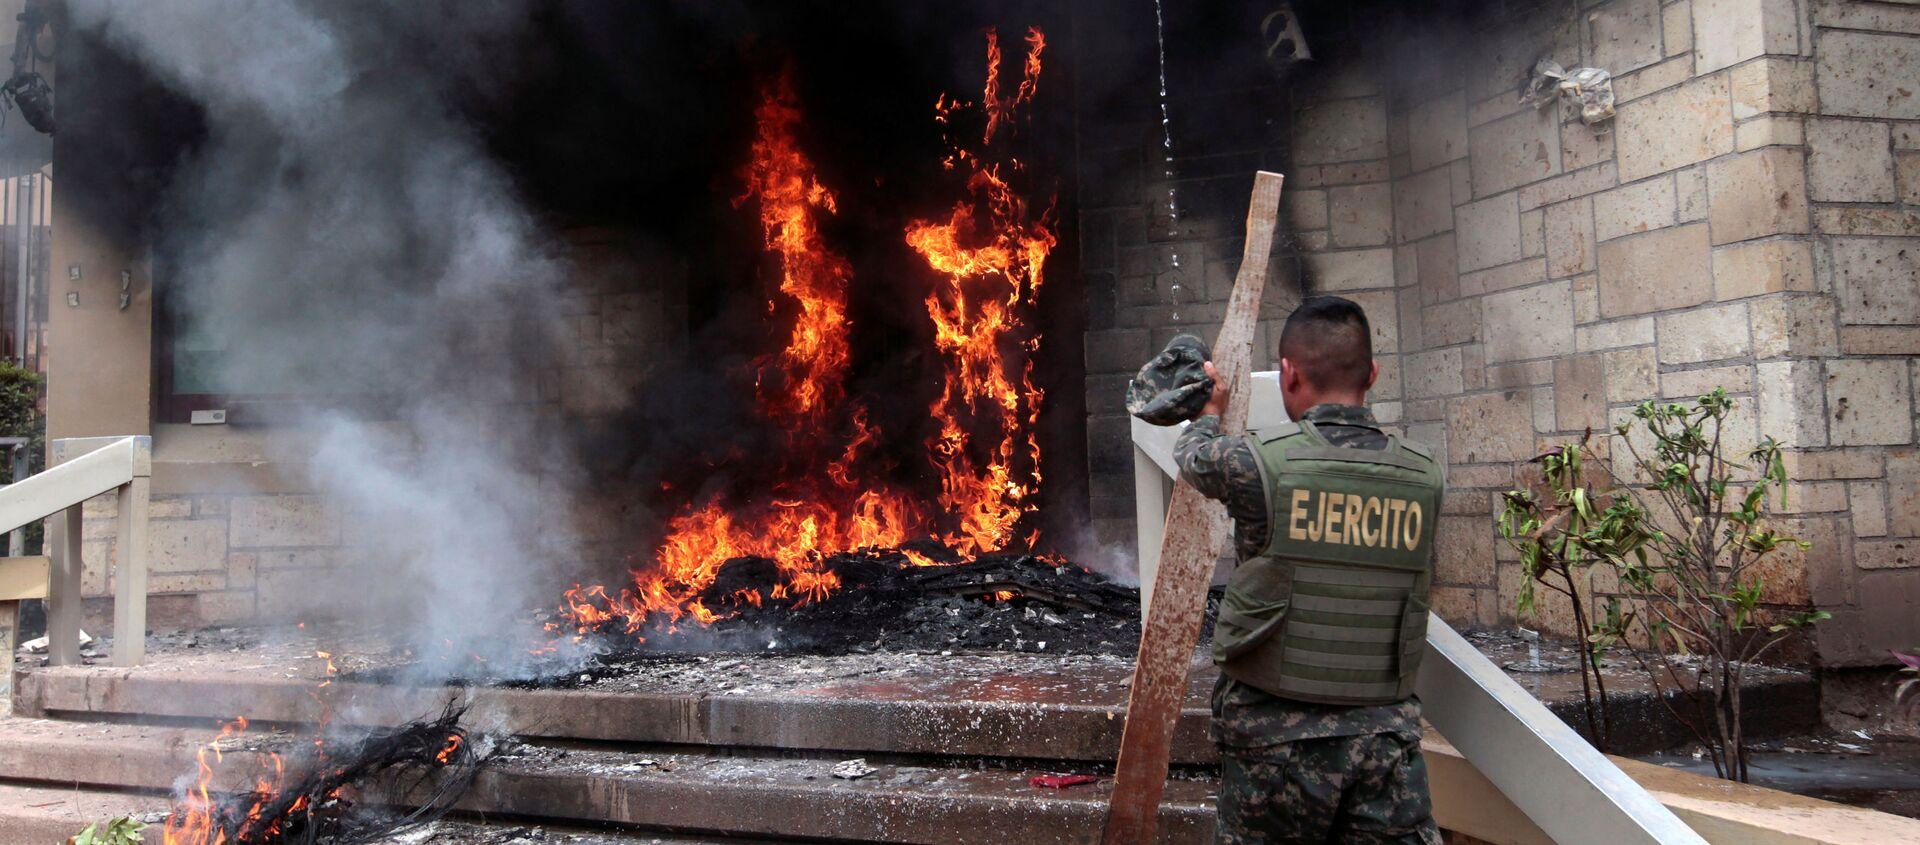 La quema de la puerta de la embajada de EEUU en Honduras - Sputnik Mundo, 1920, 03.06.2019